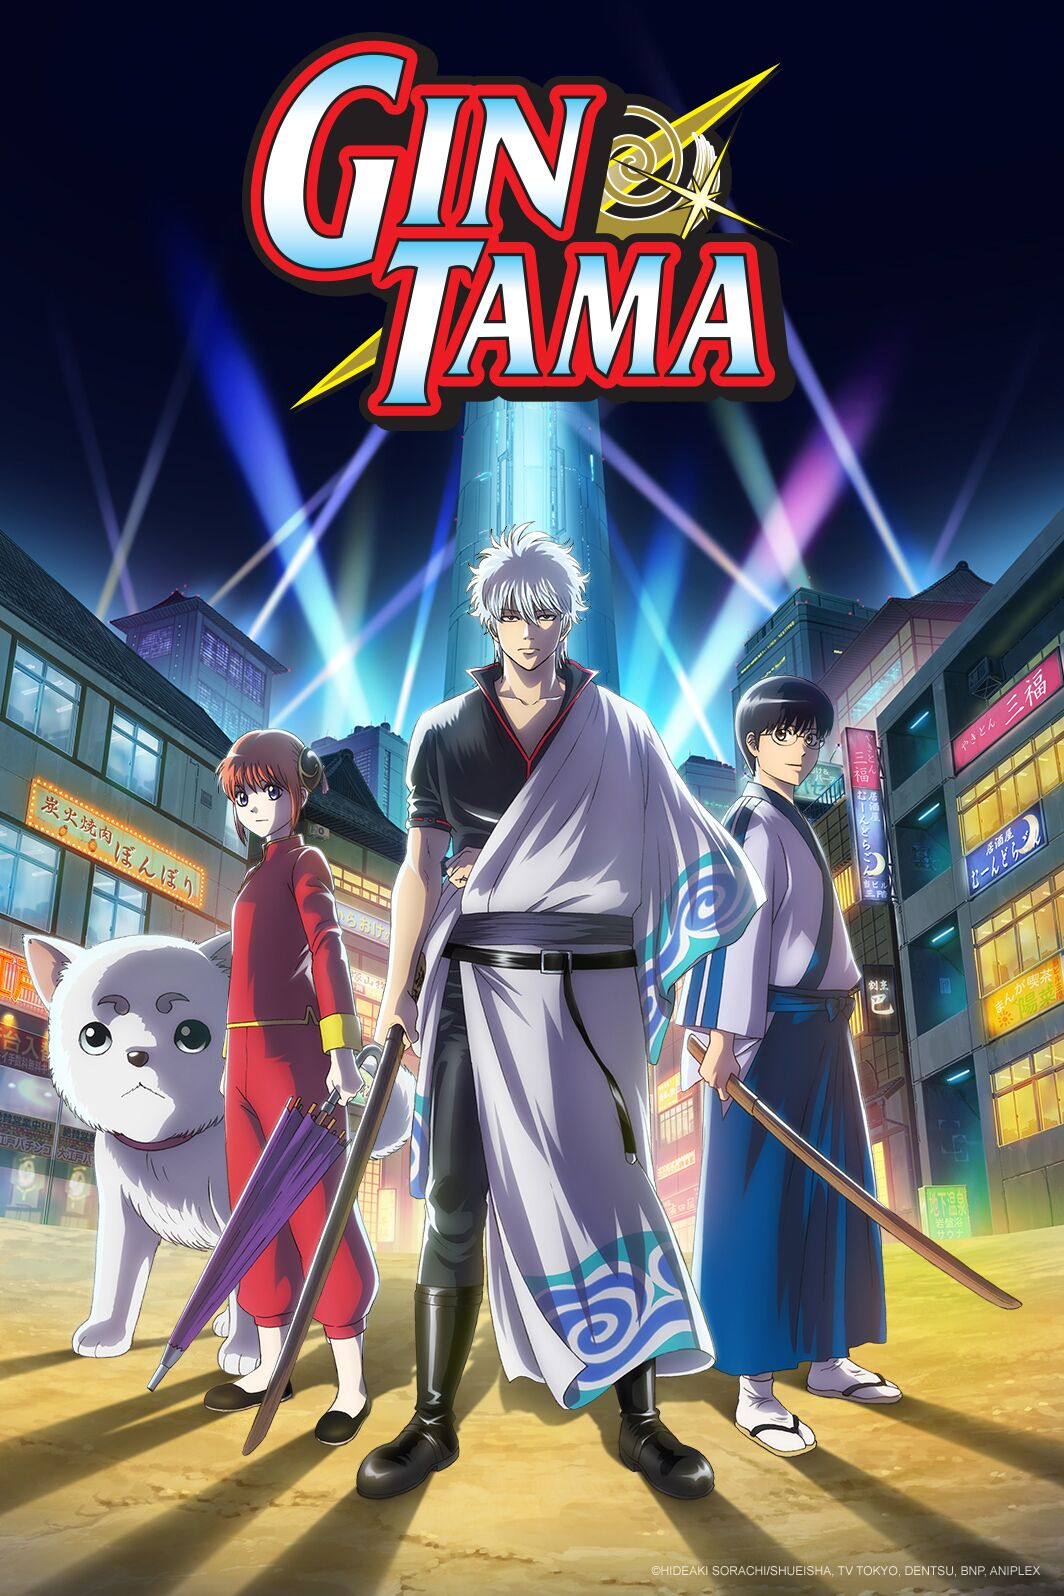 Gintama anime s4 visual